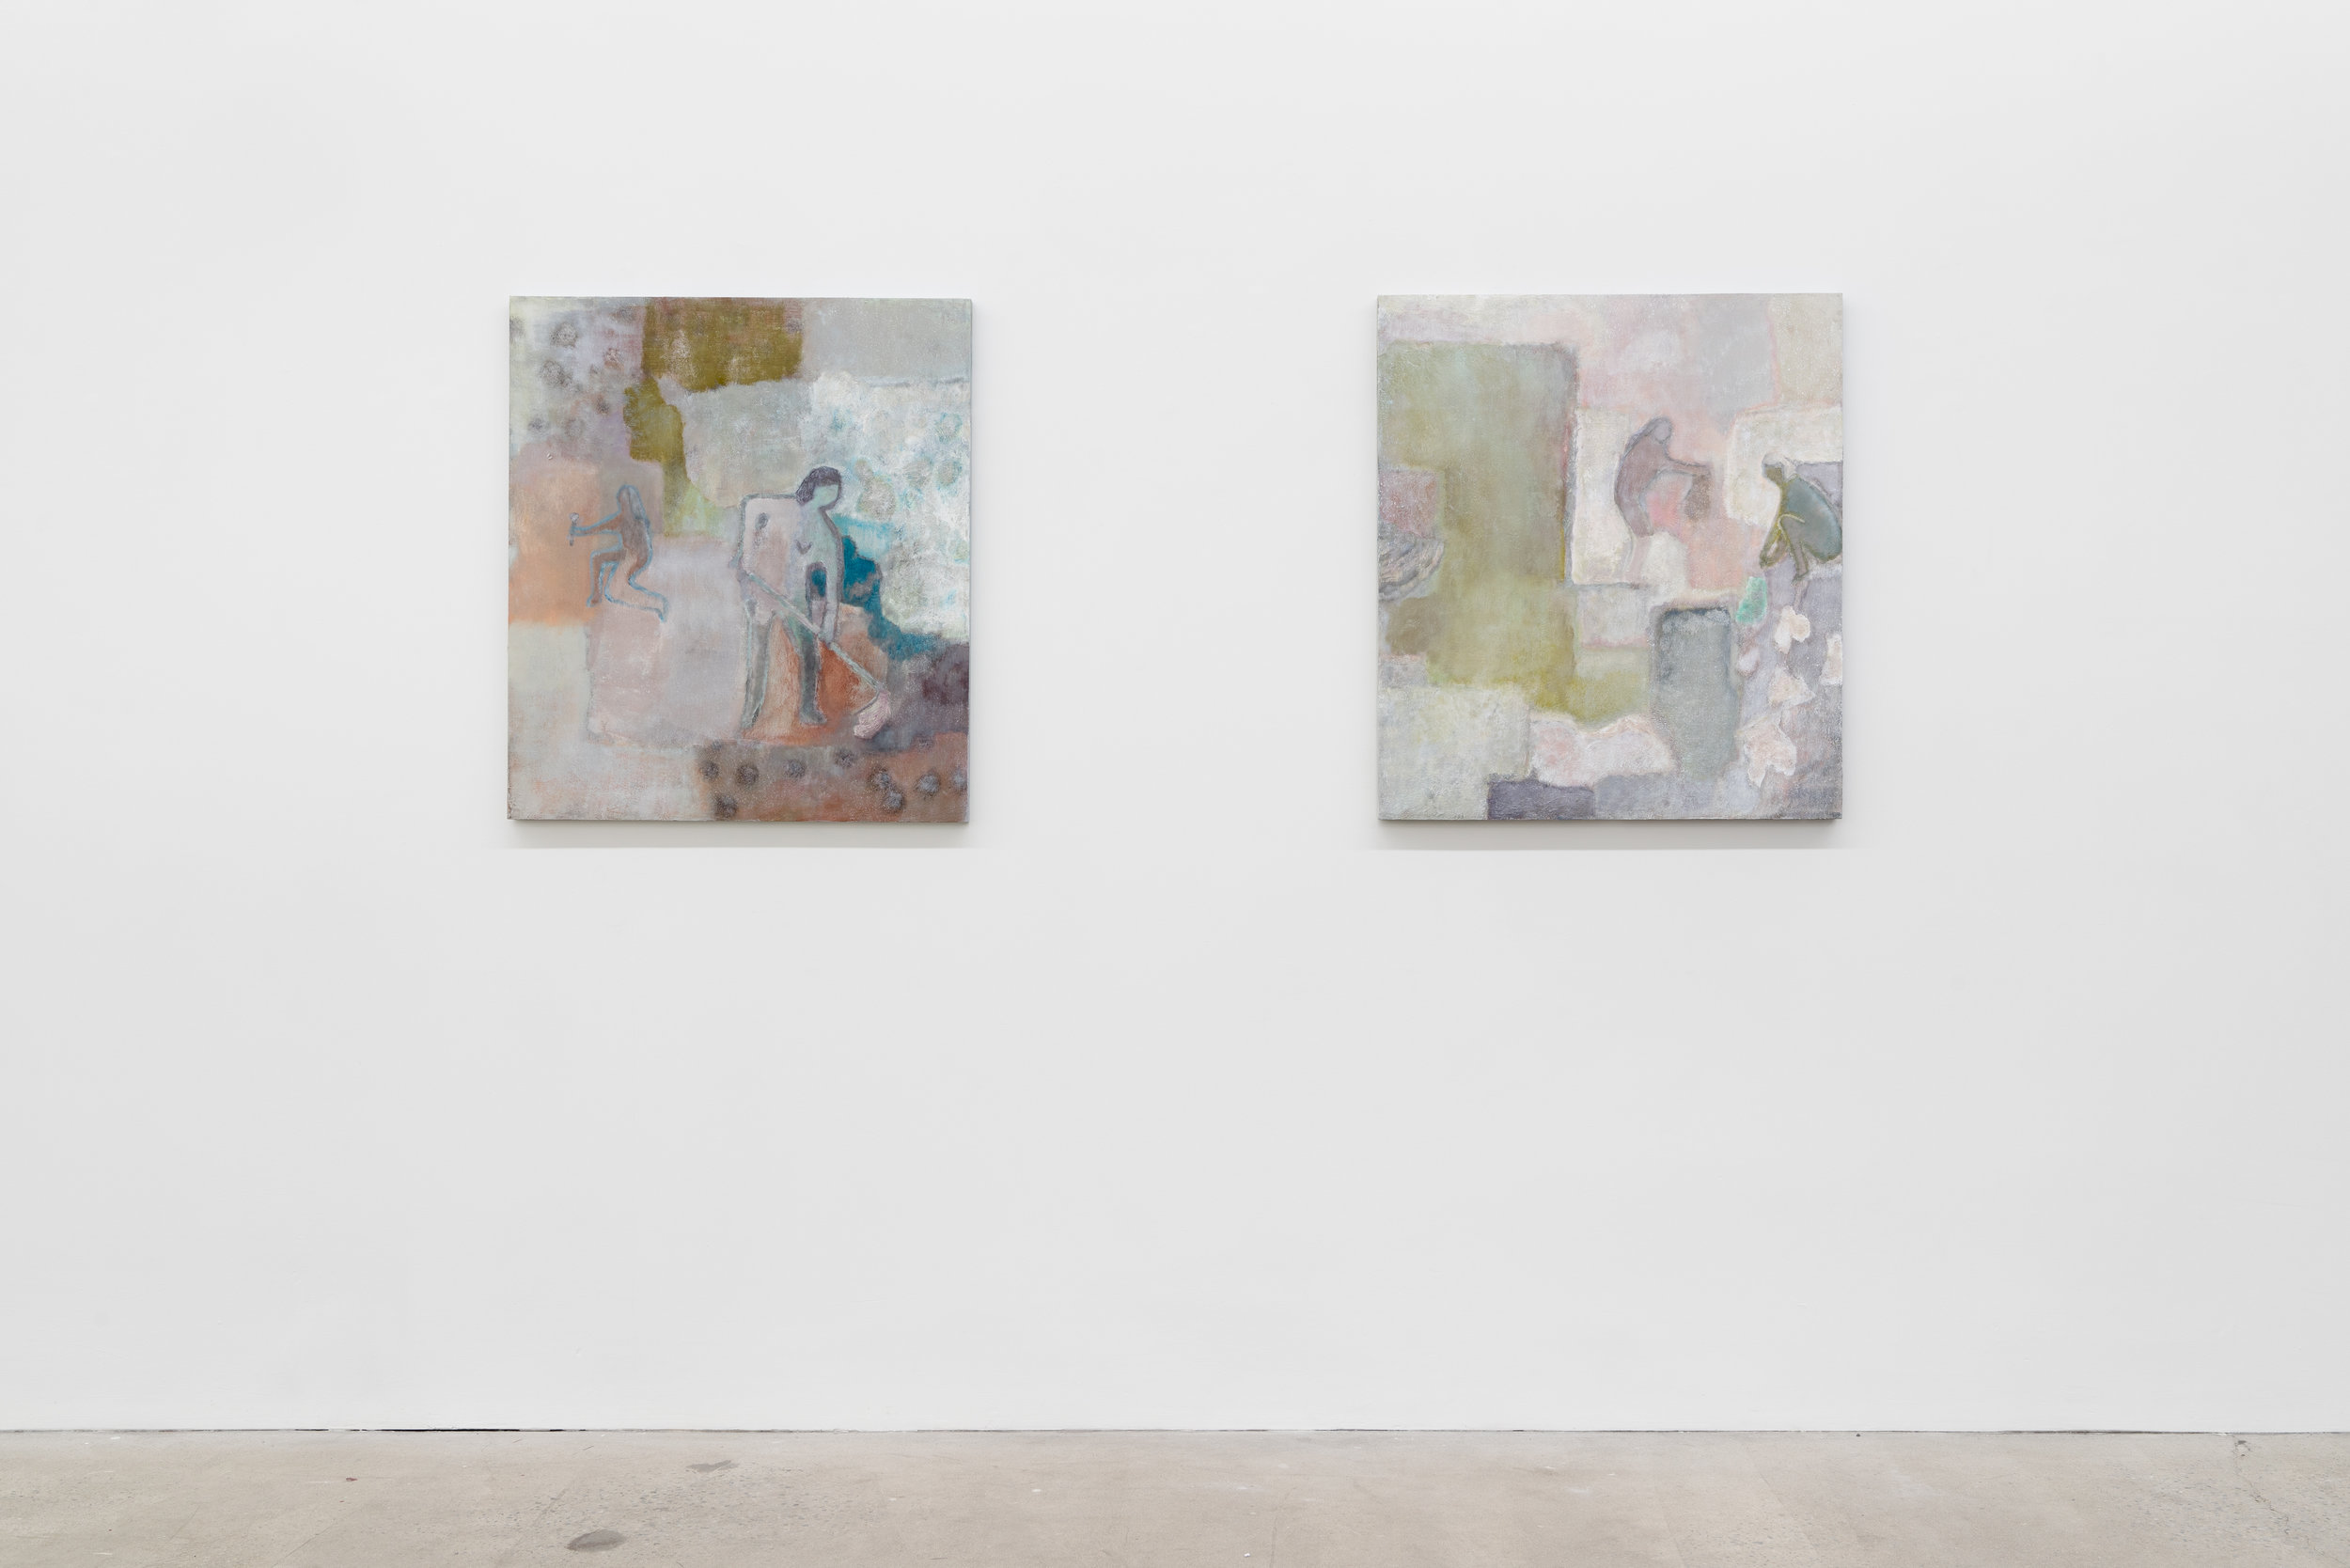 GalerieNicolasRobertNovembre2018 (22 of 27).jpg